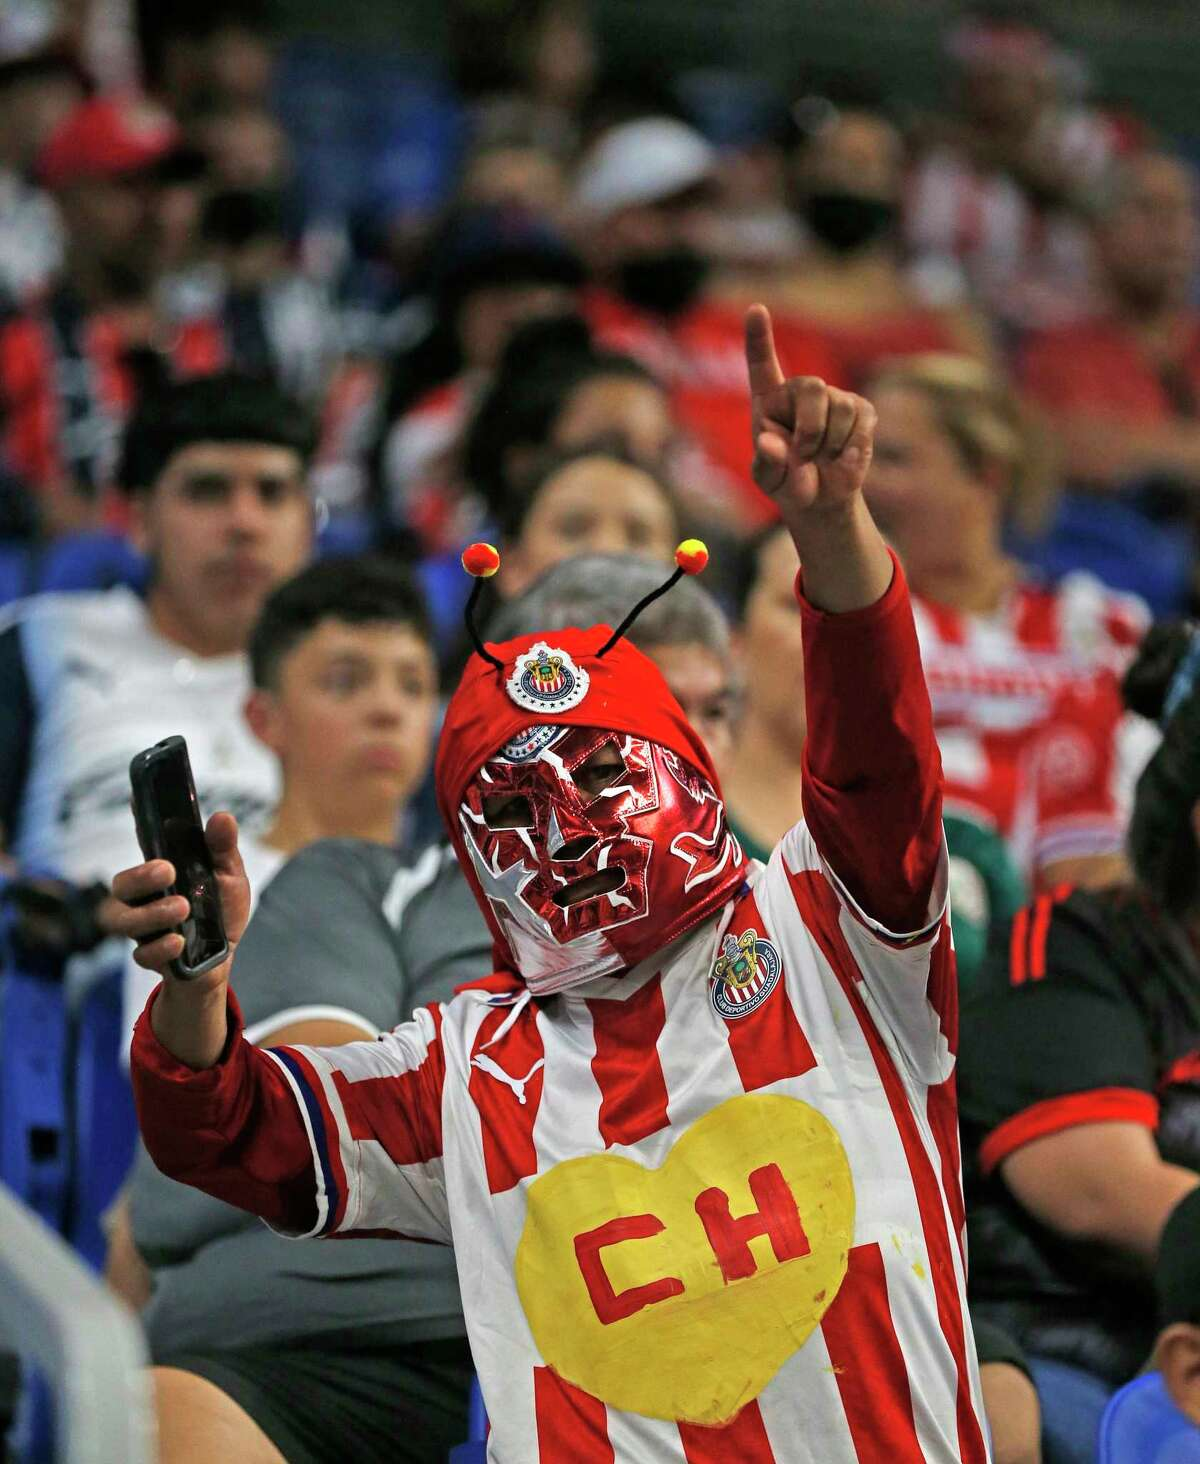 A Chivas fan cheer during Sunday's match againstMonterreyat the Alamodome. Monterrey won, 1-0.